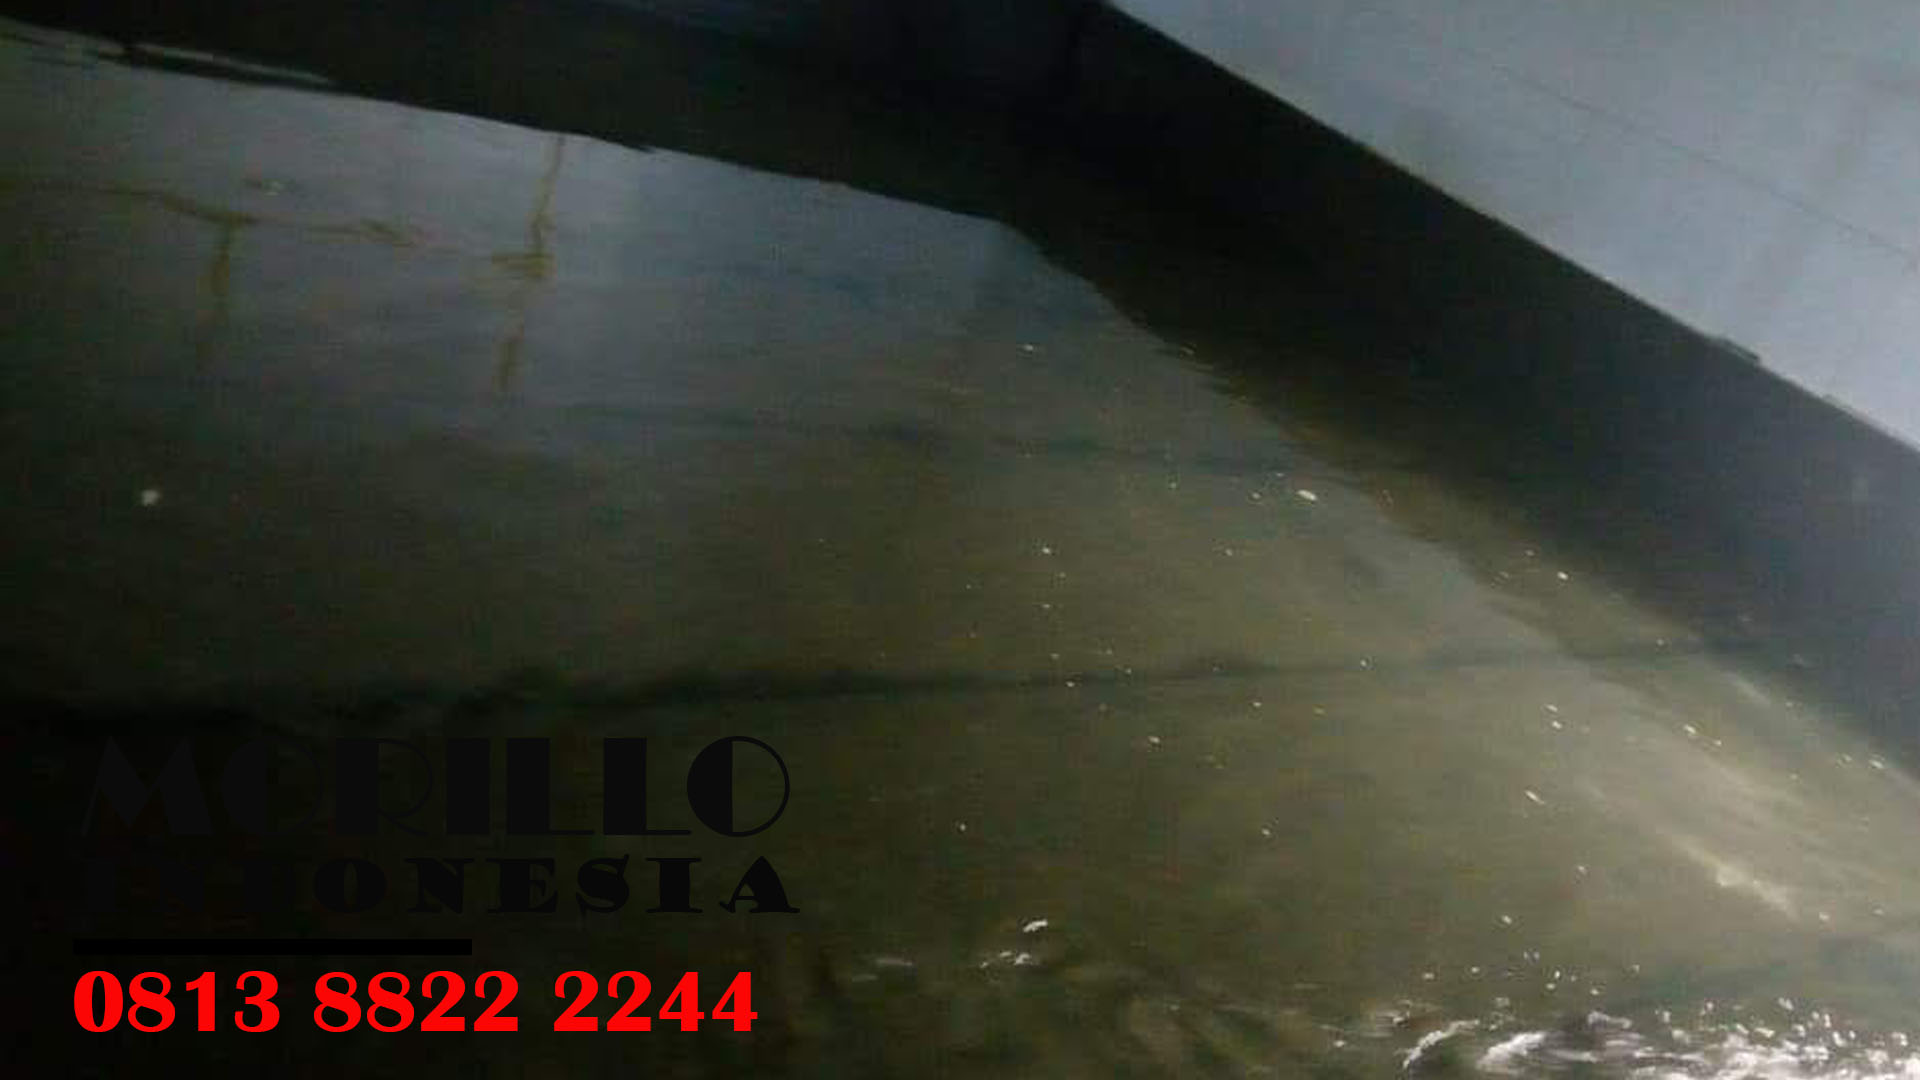 MEMBRAN ASPAL di CILANDAK TIMUR TELEPON : 08 13 88 22 22 44